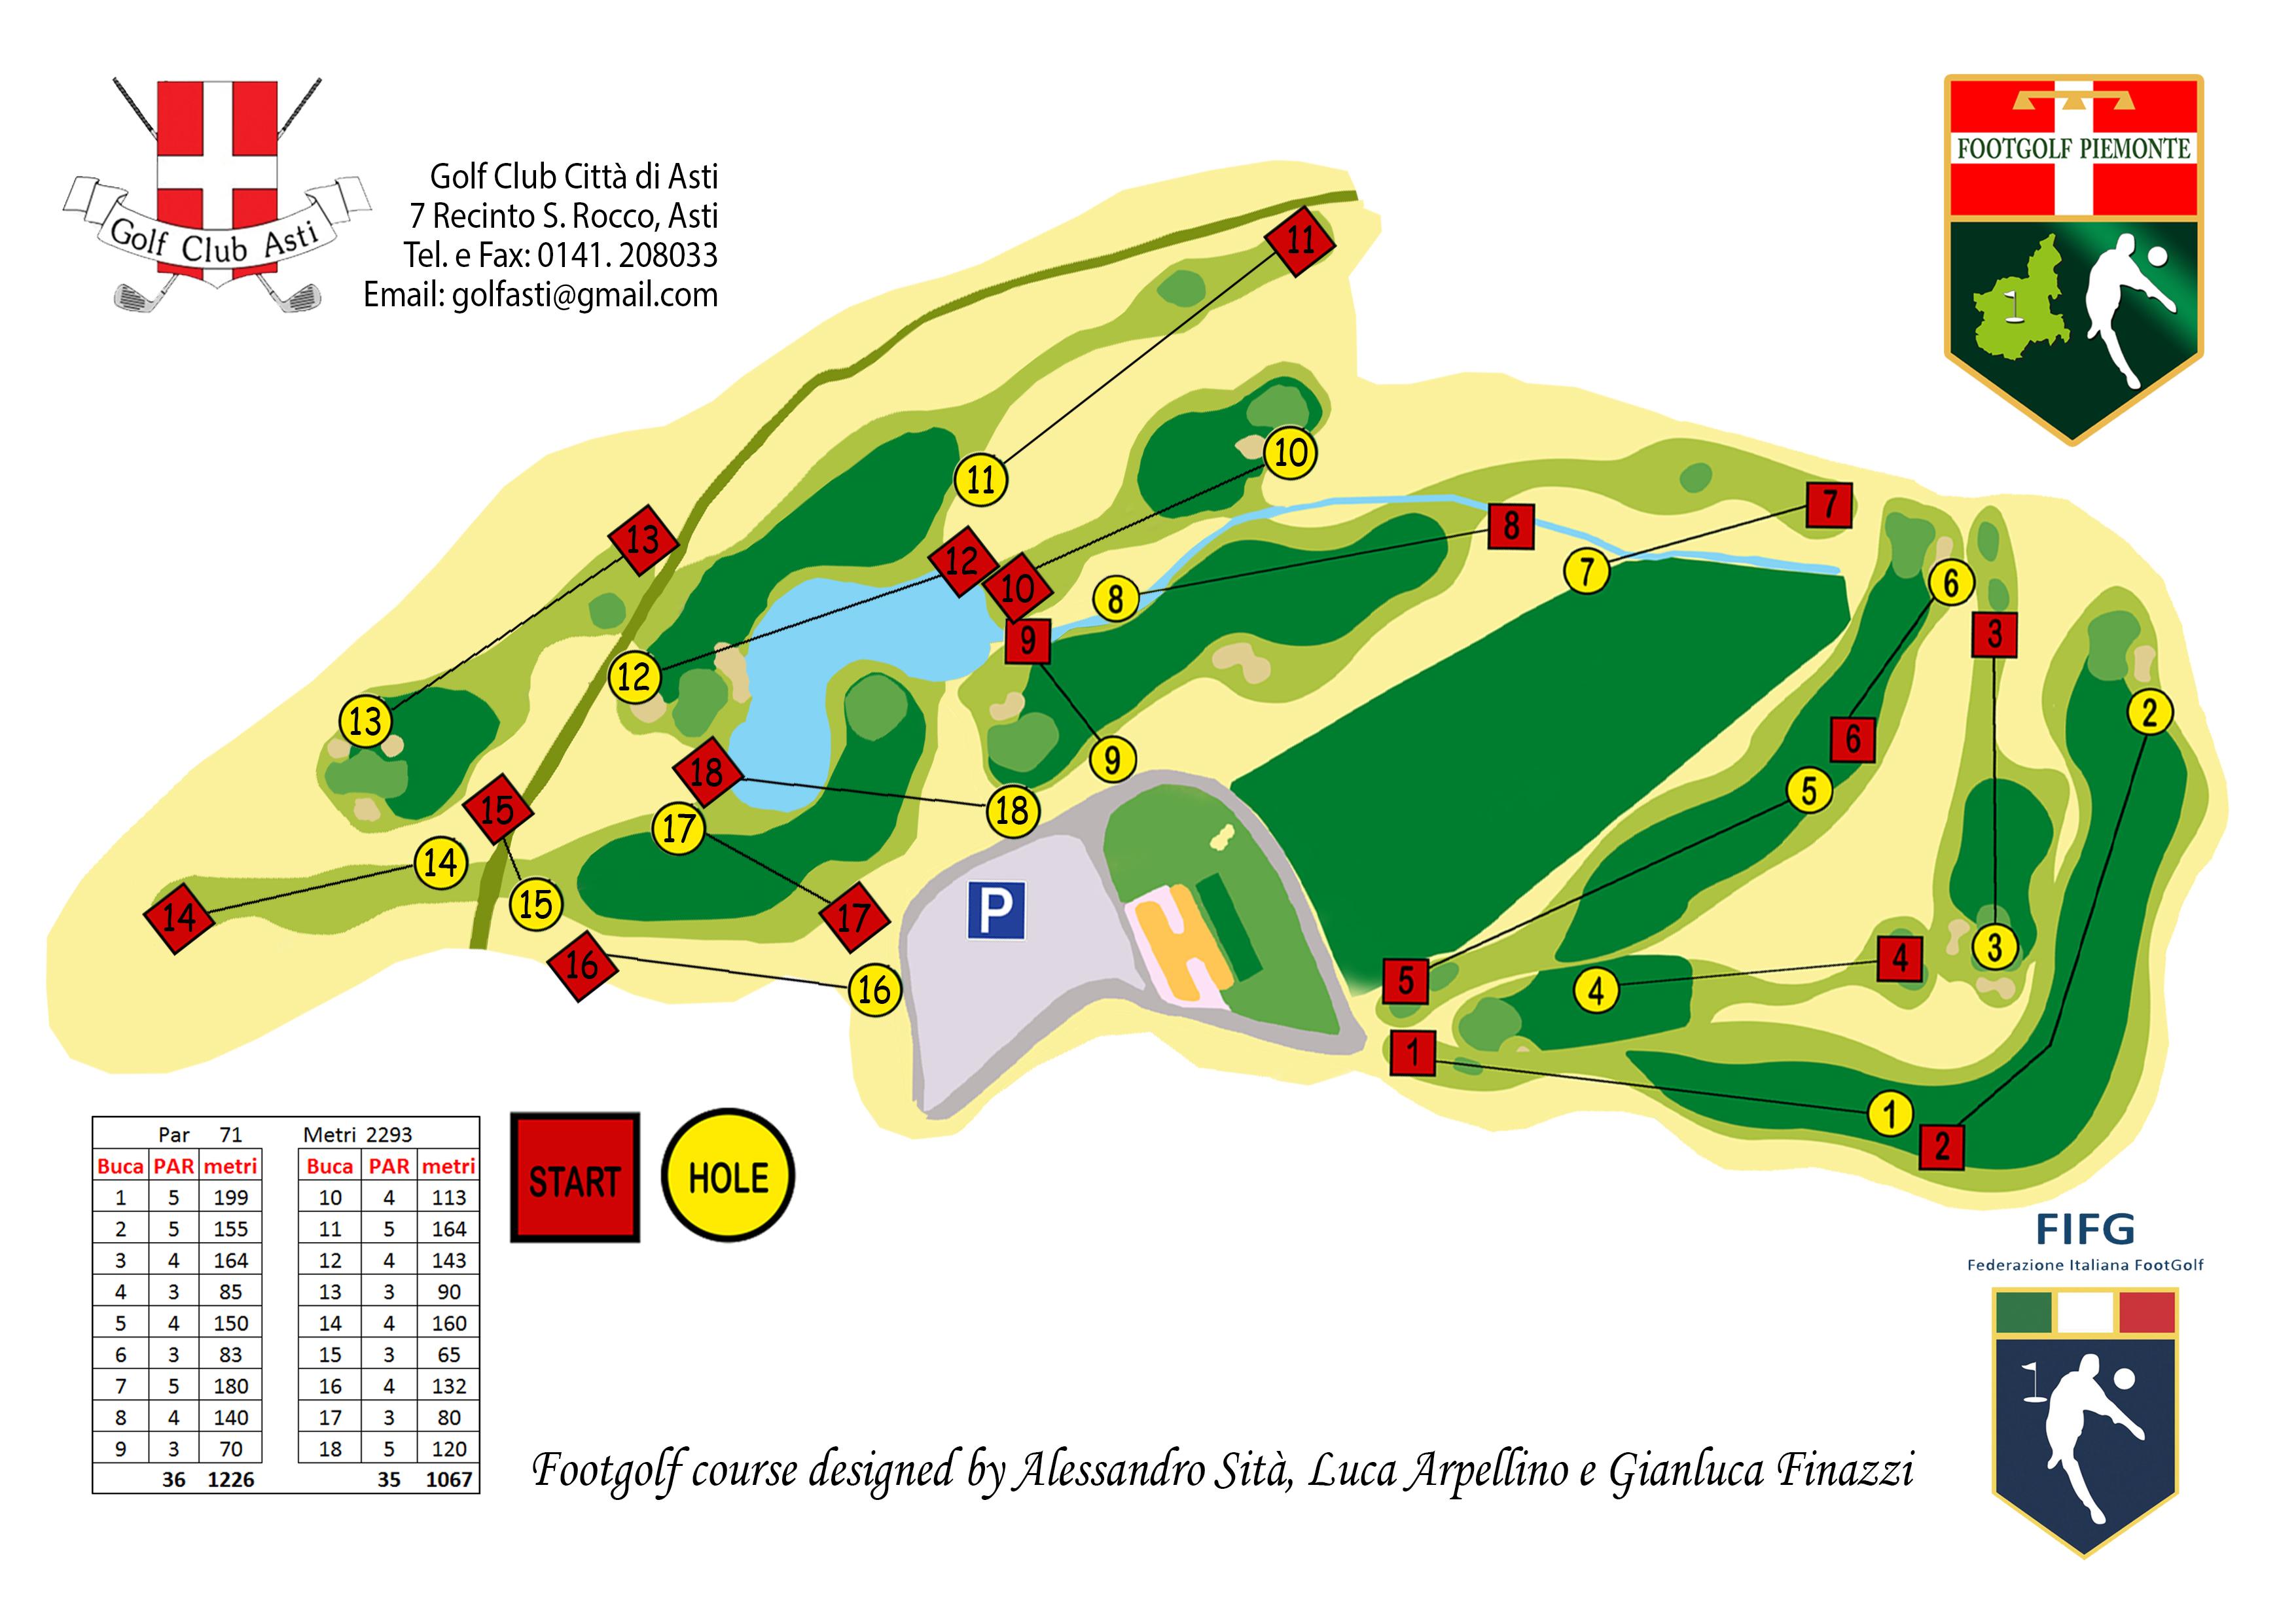 Footgolf-Course-Golf-Club-Città-di-Asti-18buche